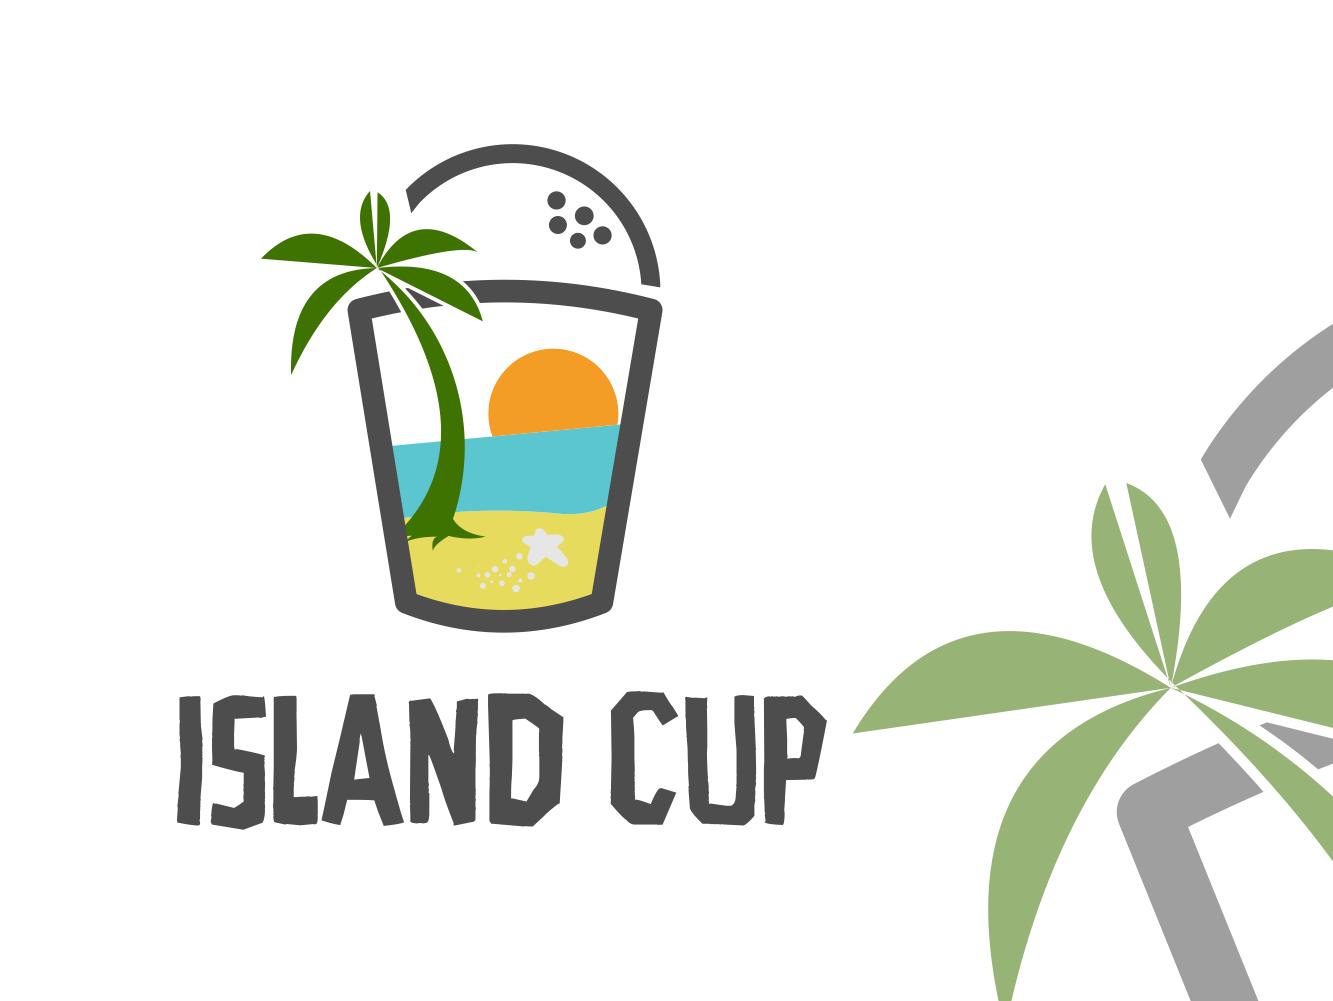 Island Cup logo